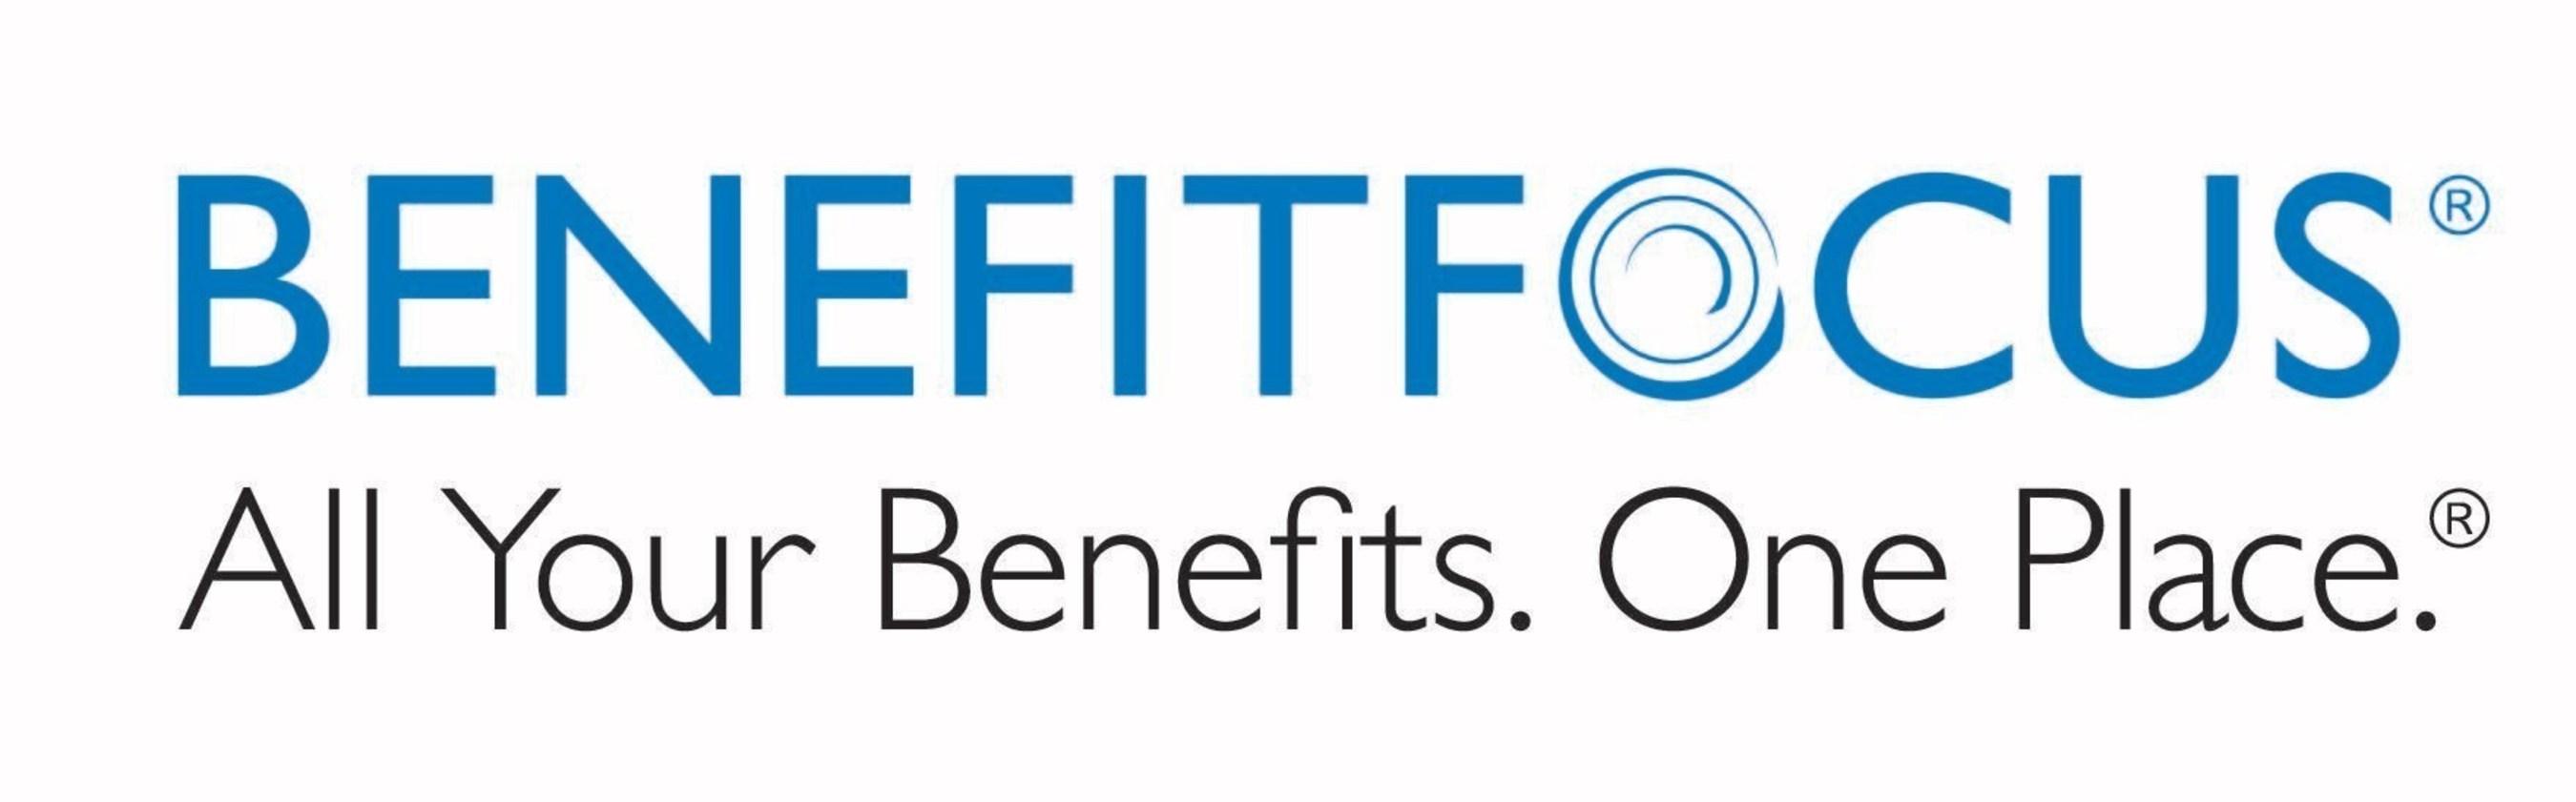 Benefitfocus logo (PRNewsFoto/Benefitfocus, Inc.)